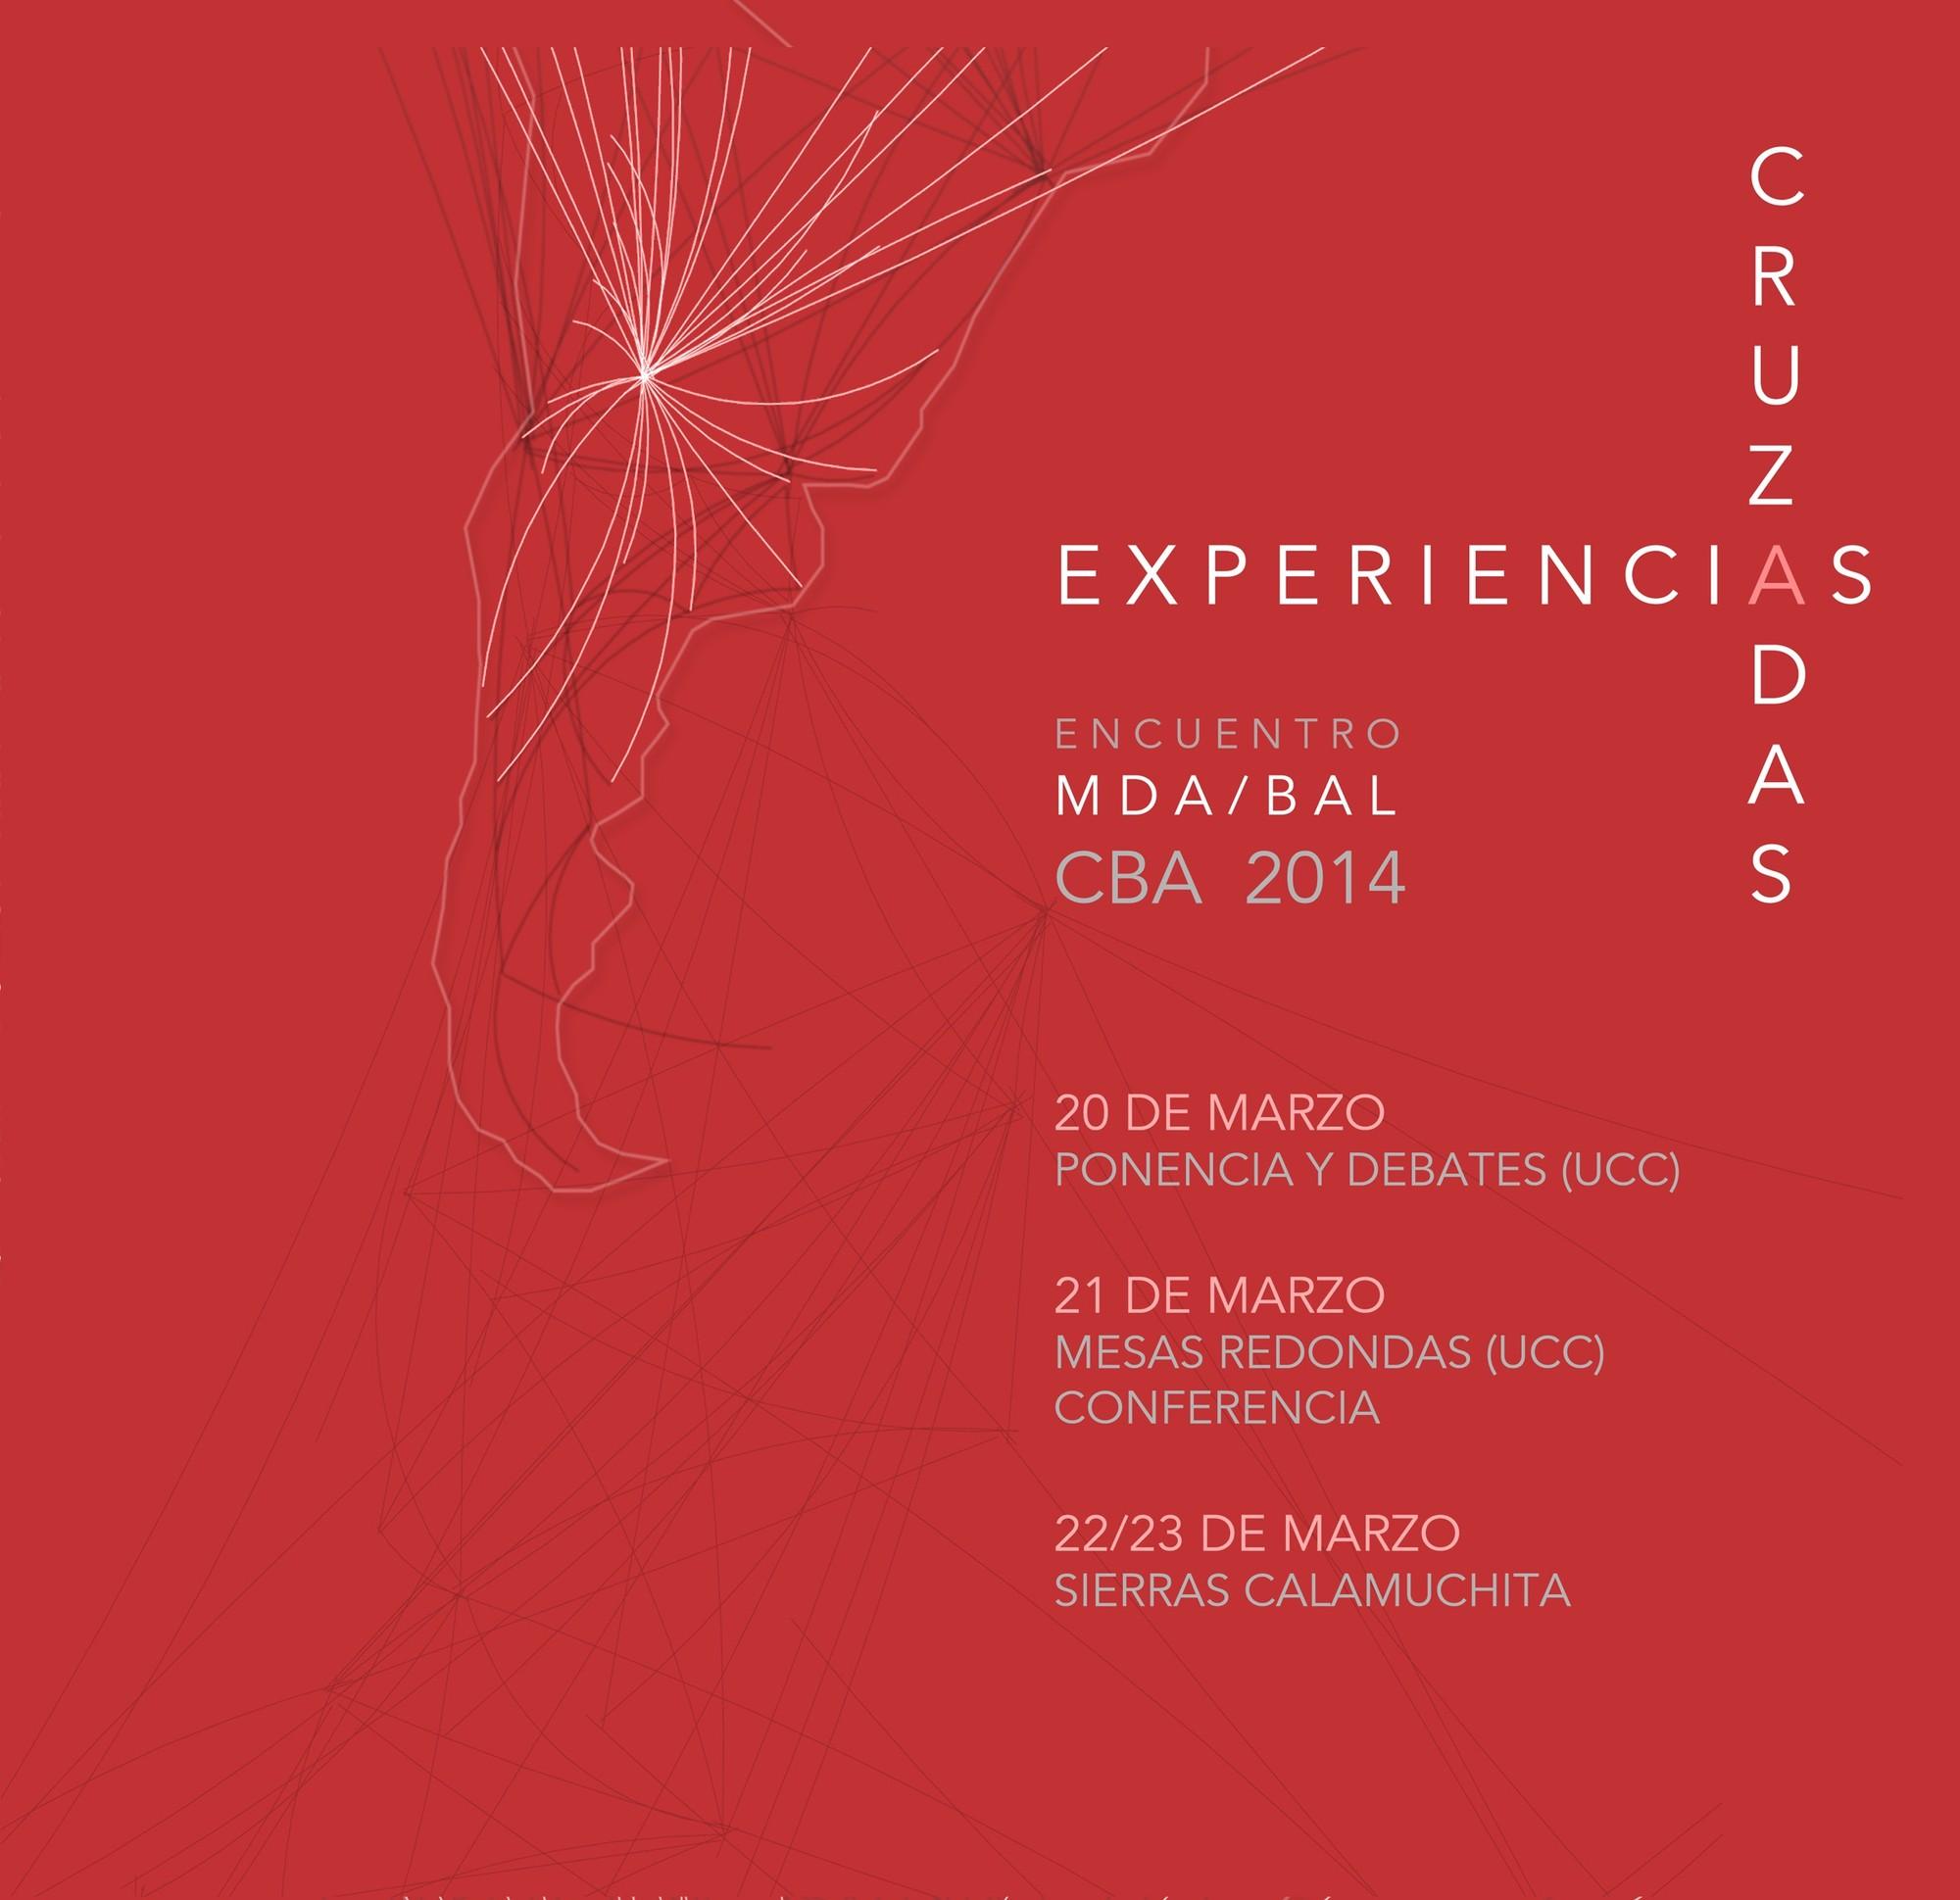 Encuentro MDA, Experiencias Cruzadas / Córdoba 2014